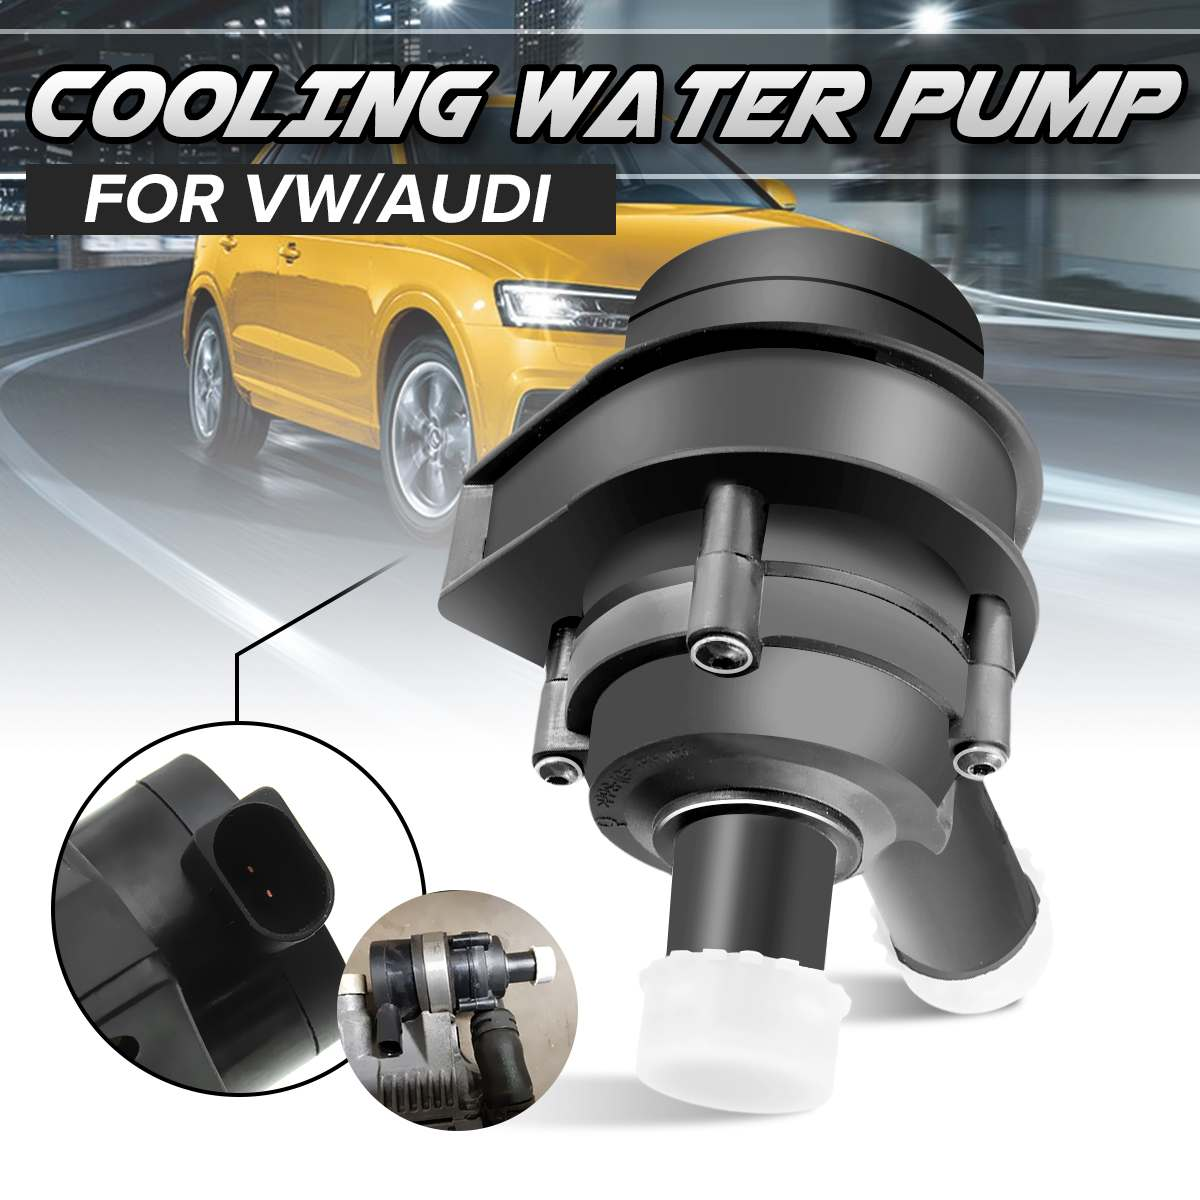 Car Engine Cooling เสริมเพิ่มเติมปั๊มน้ำ 1K0965561J 1K0 965 561 J สำหรับ VW Passat B5 B6 Jetta Golf CC สำหรับ Audi A3